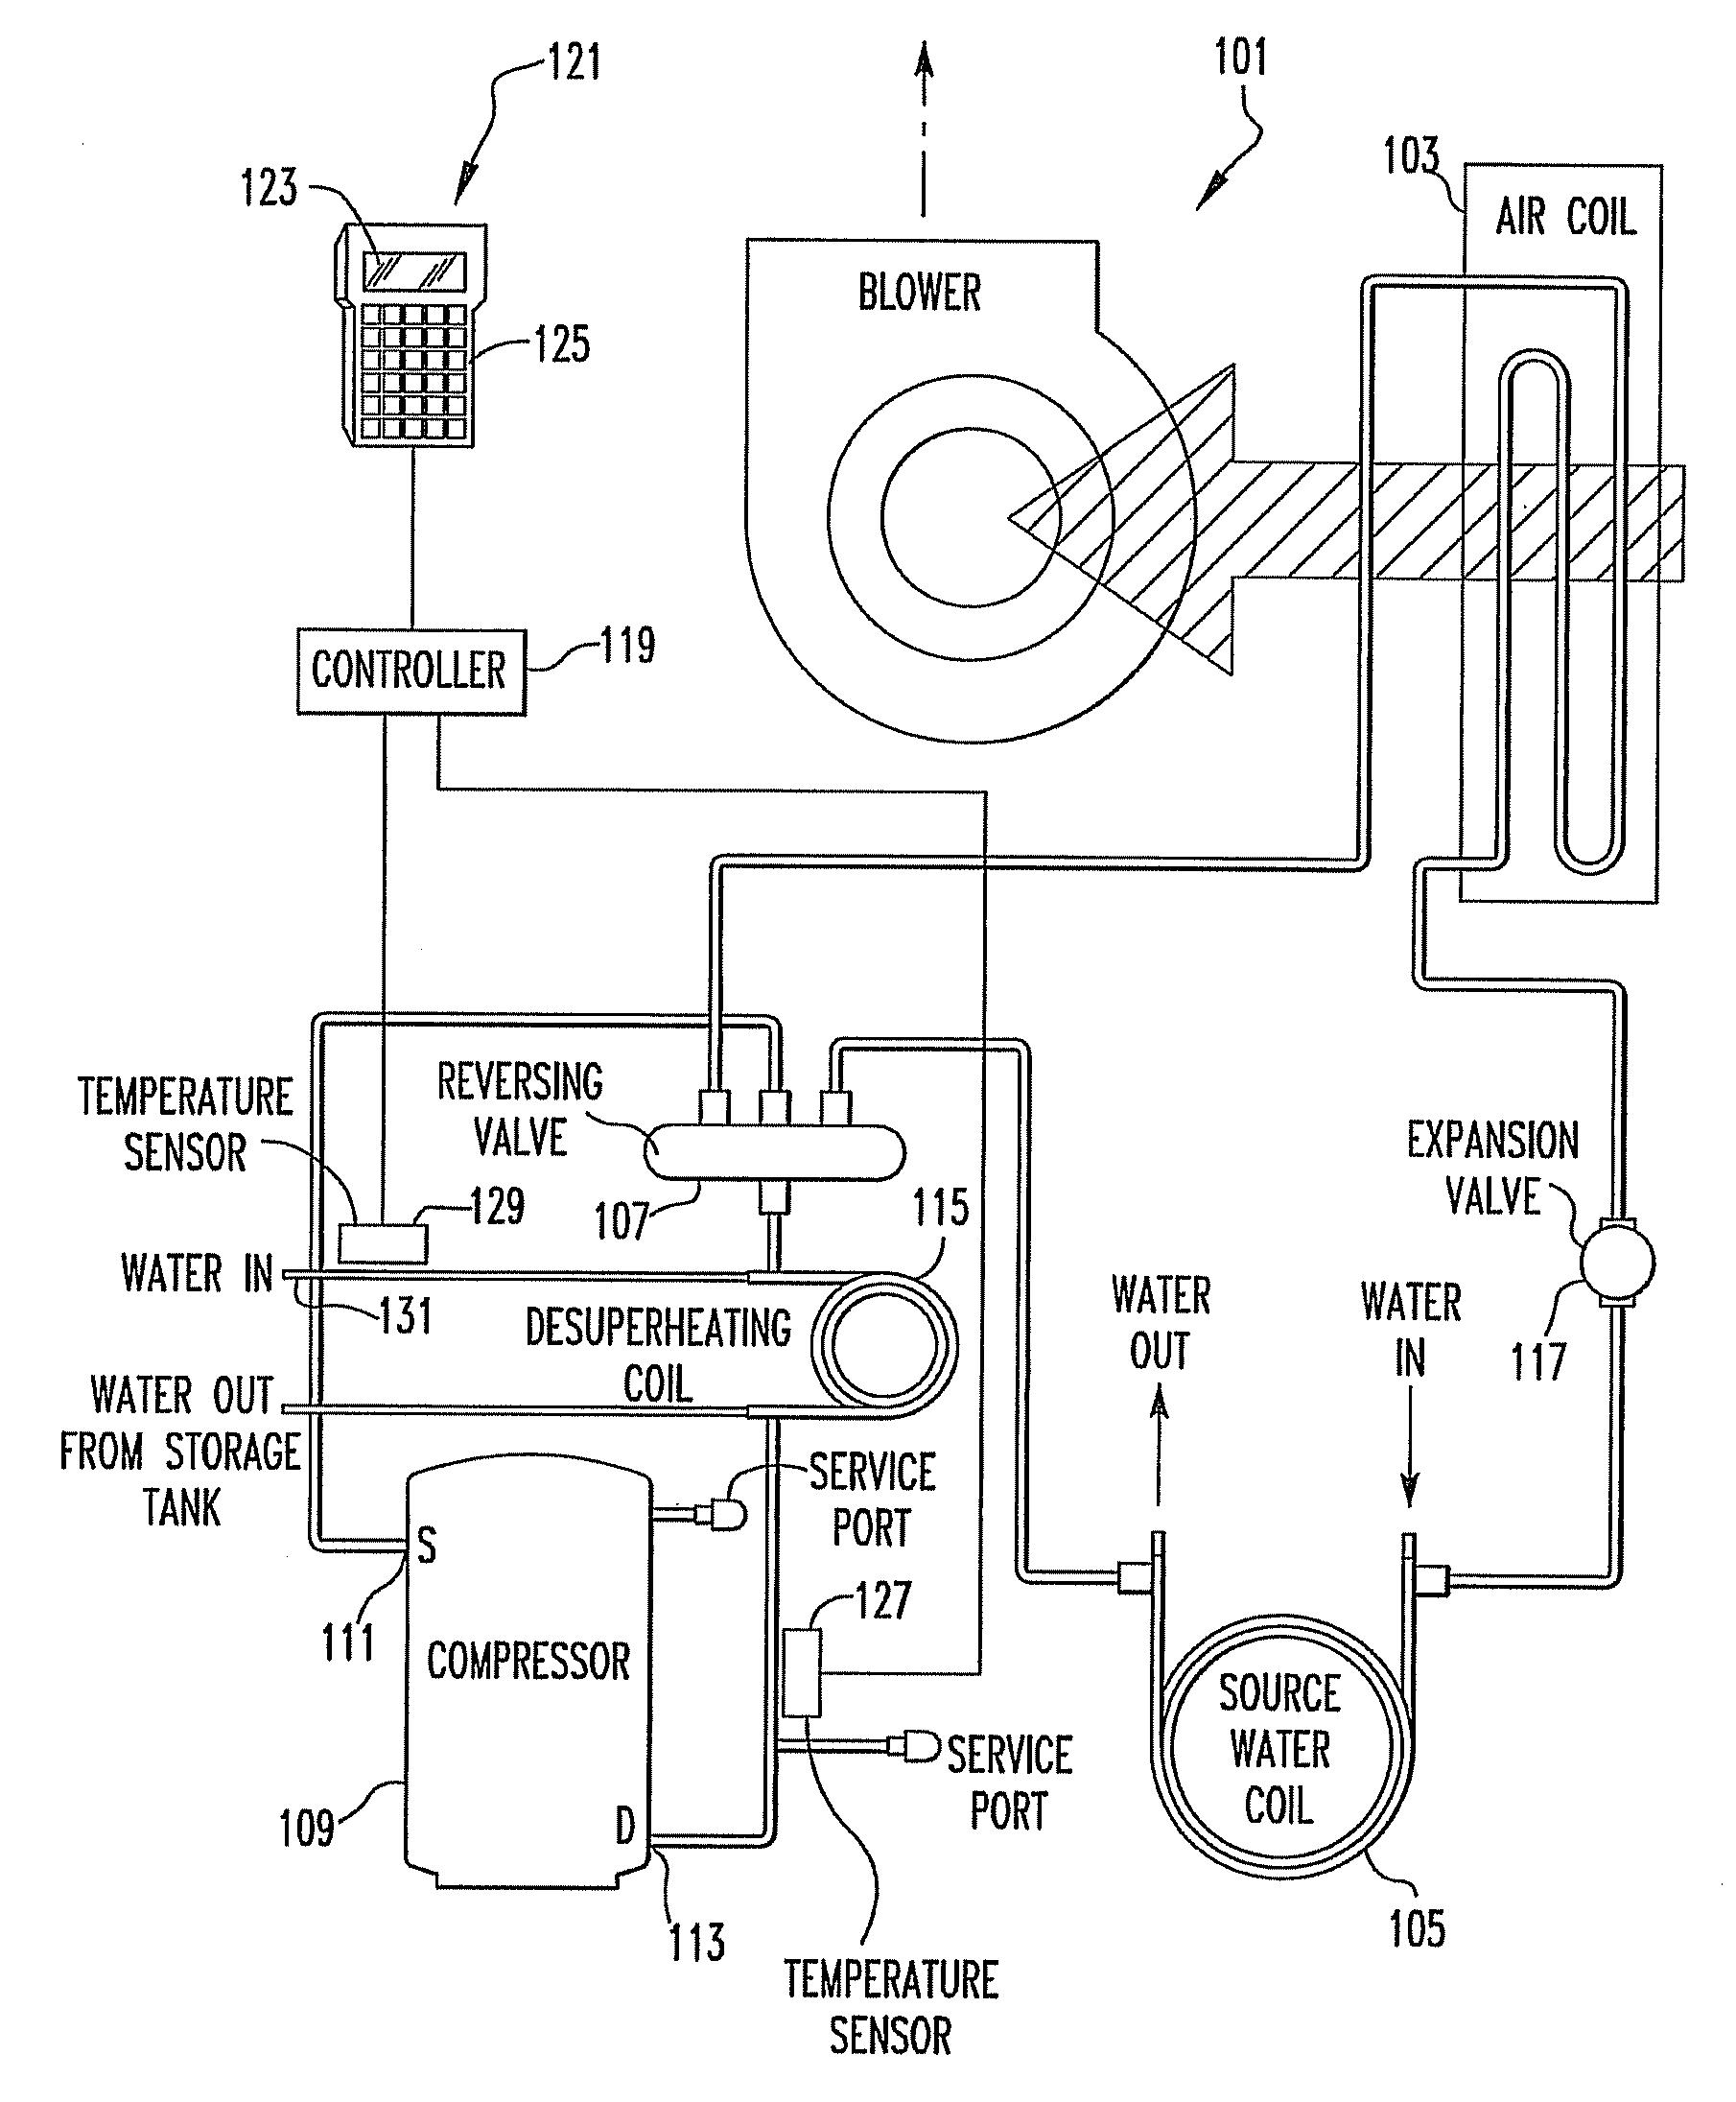 Desuperheater Wiring Diagram : 28 Wiring Diagram Images